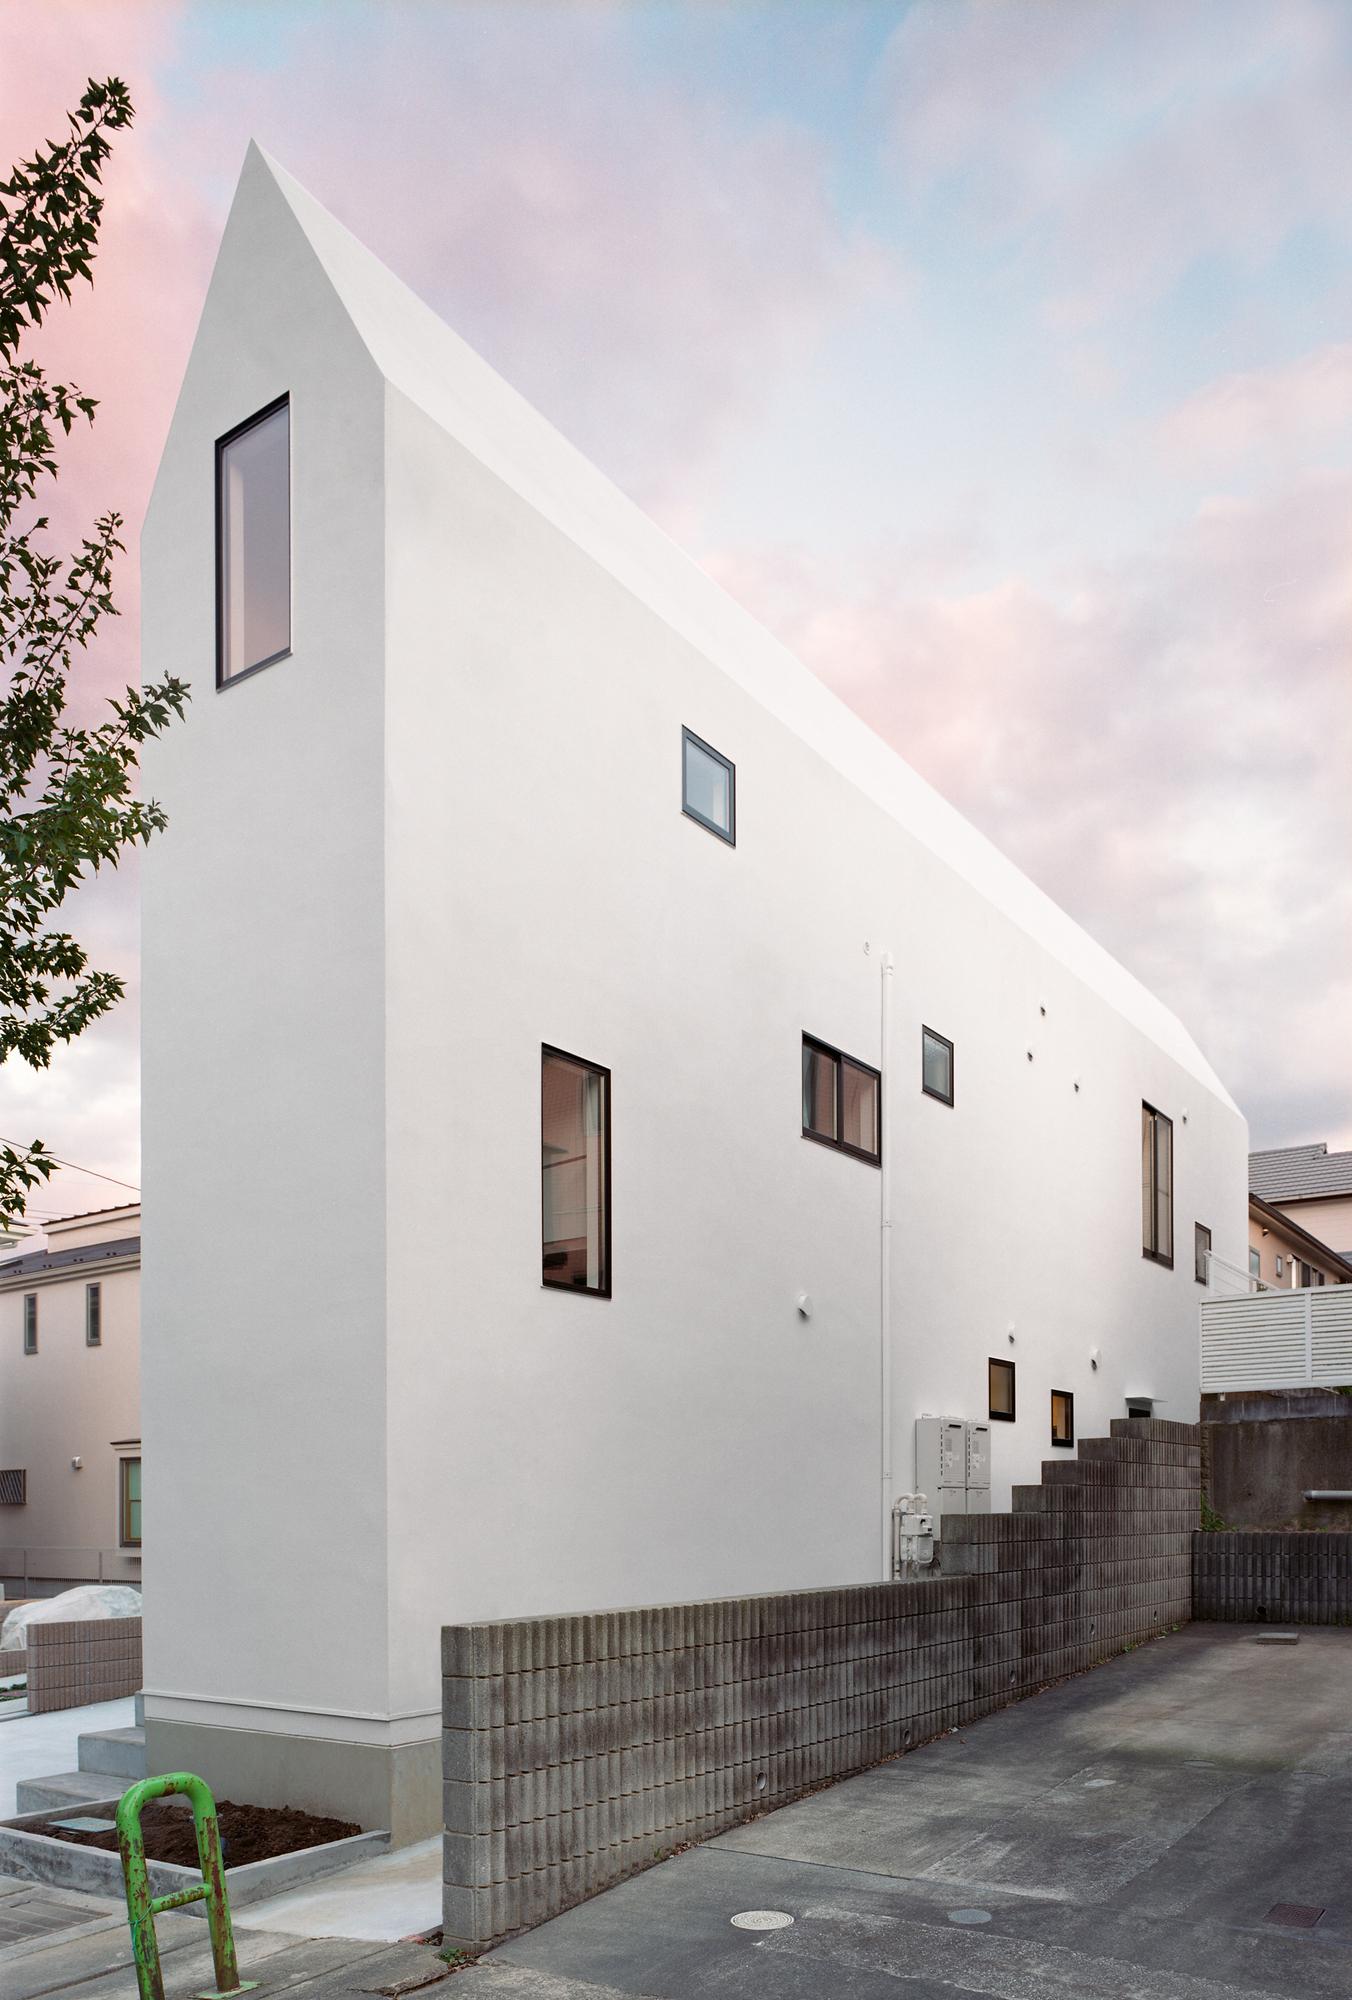 Casa K / Hiroyuki Shinozaki Architects, © Kai Nakamura